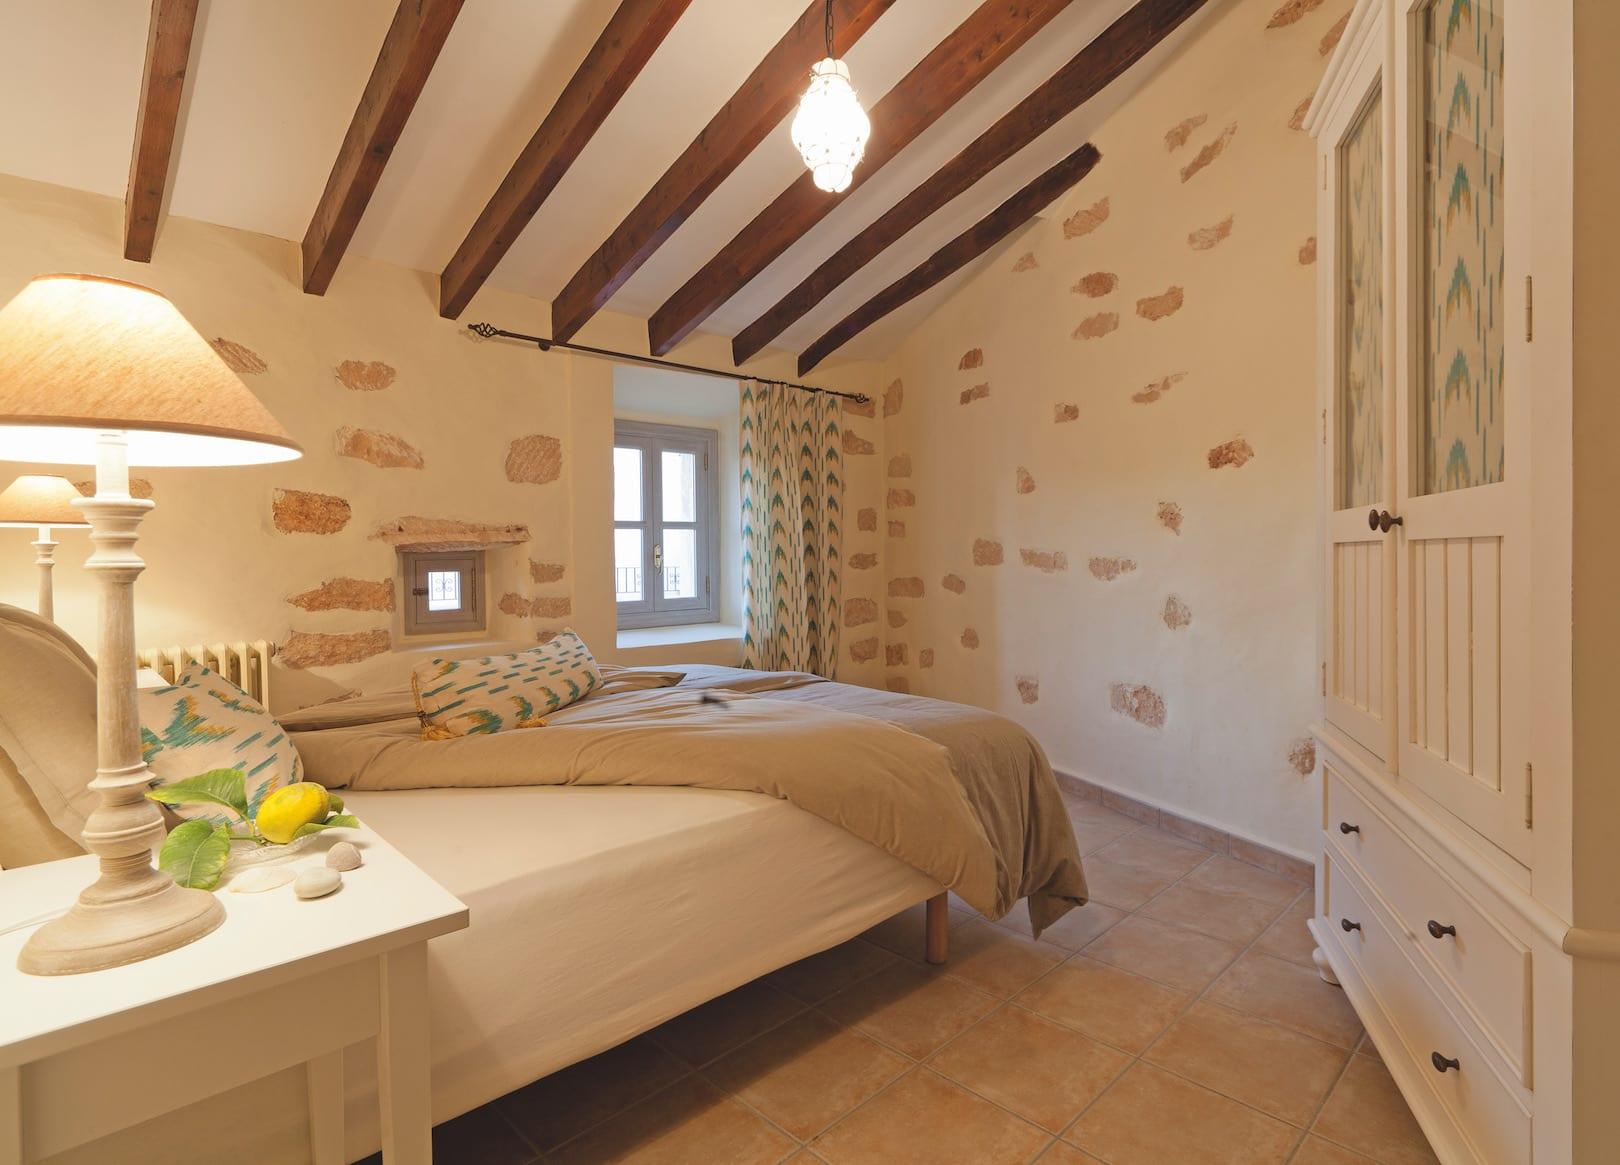 Stadthaus Casa Mar Bedroom 2